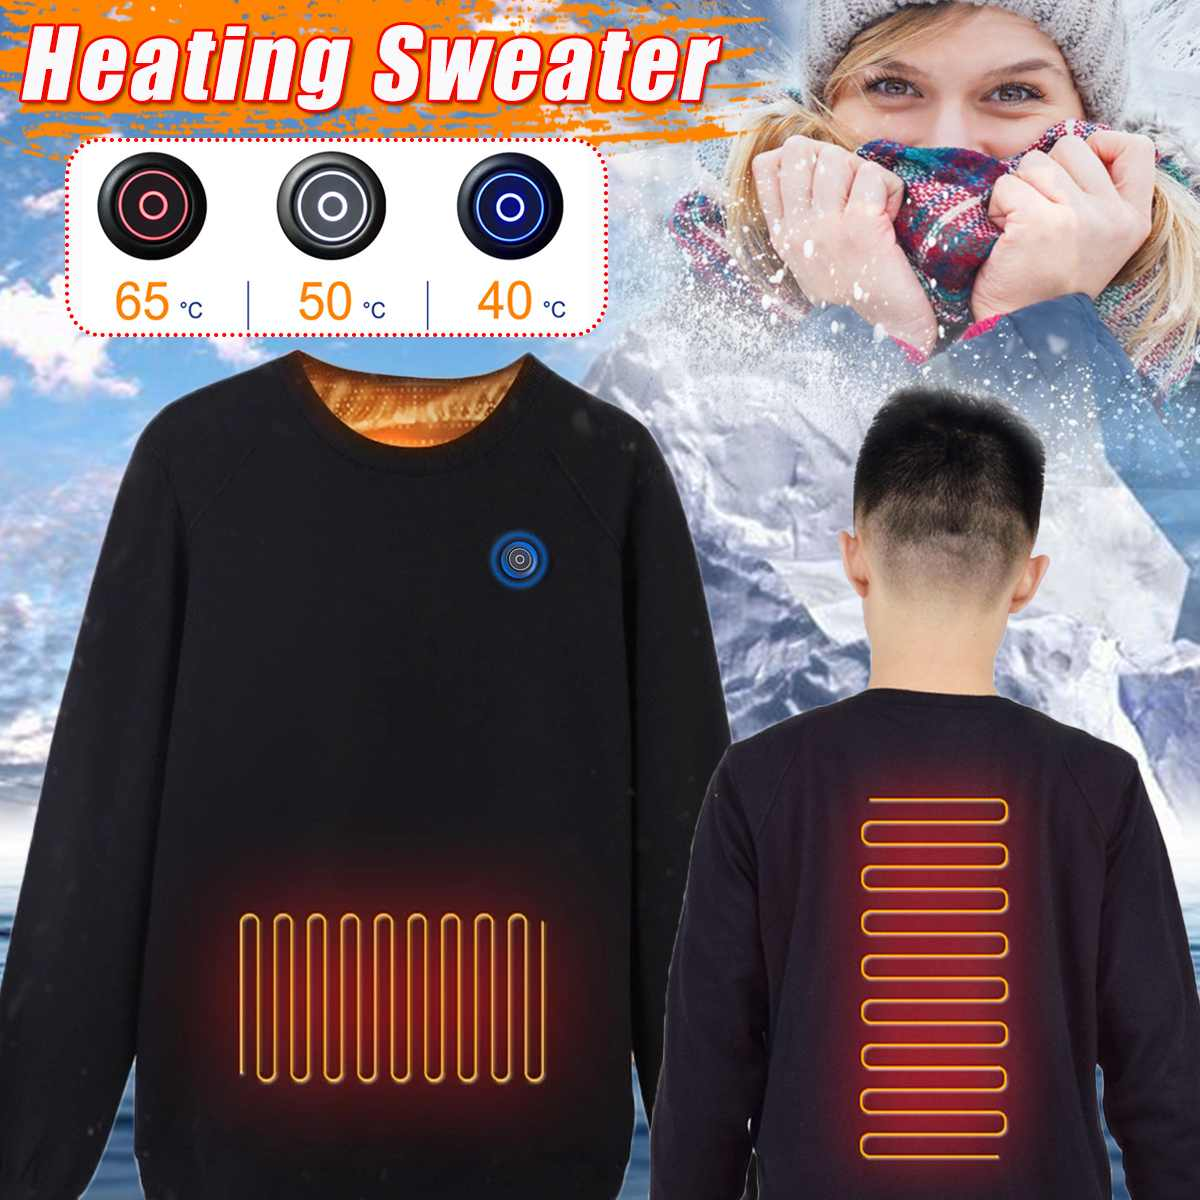 Men Women USB Heating Clothes Winter Electric Heating Sweaters Shirt Carbon Fiber Heated Warm Jacket